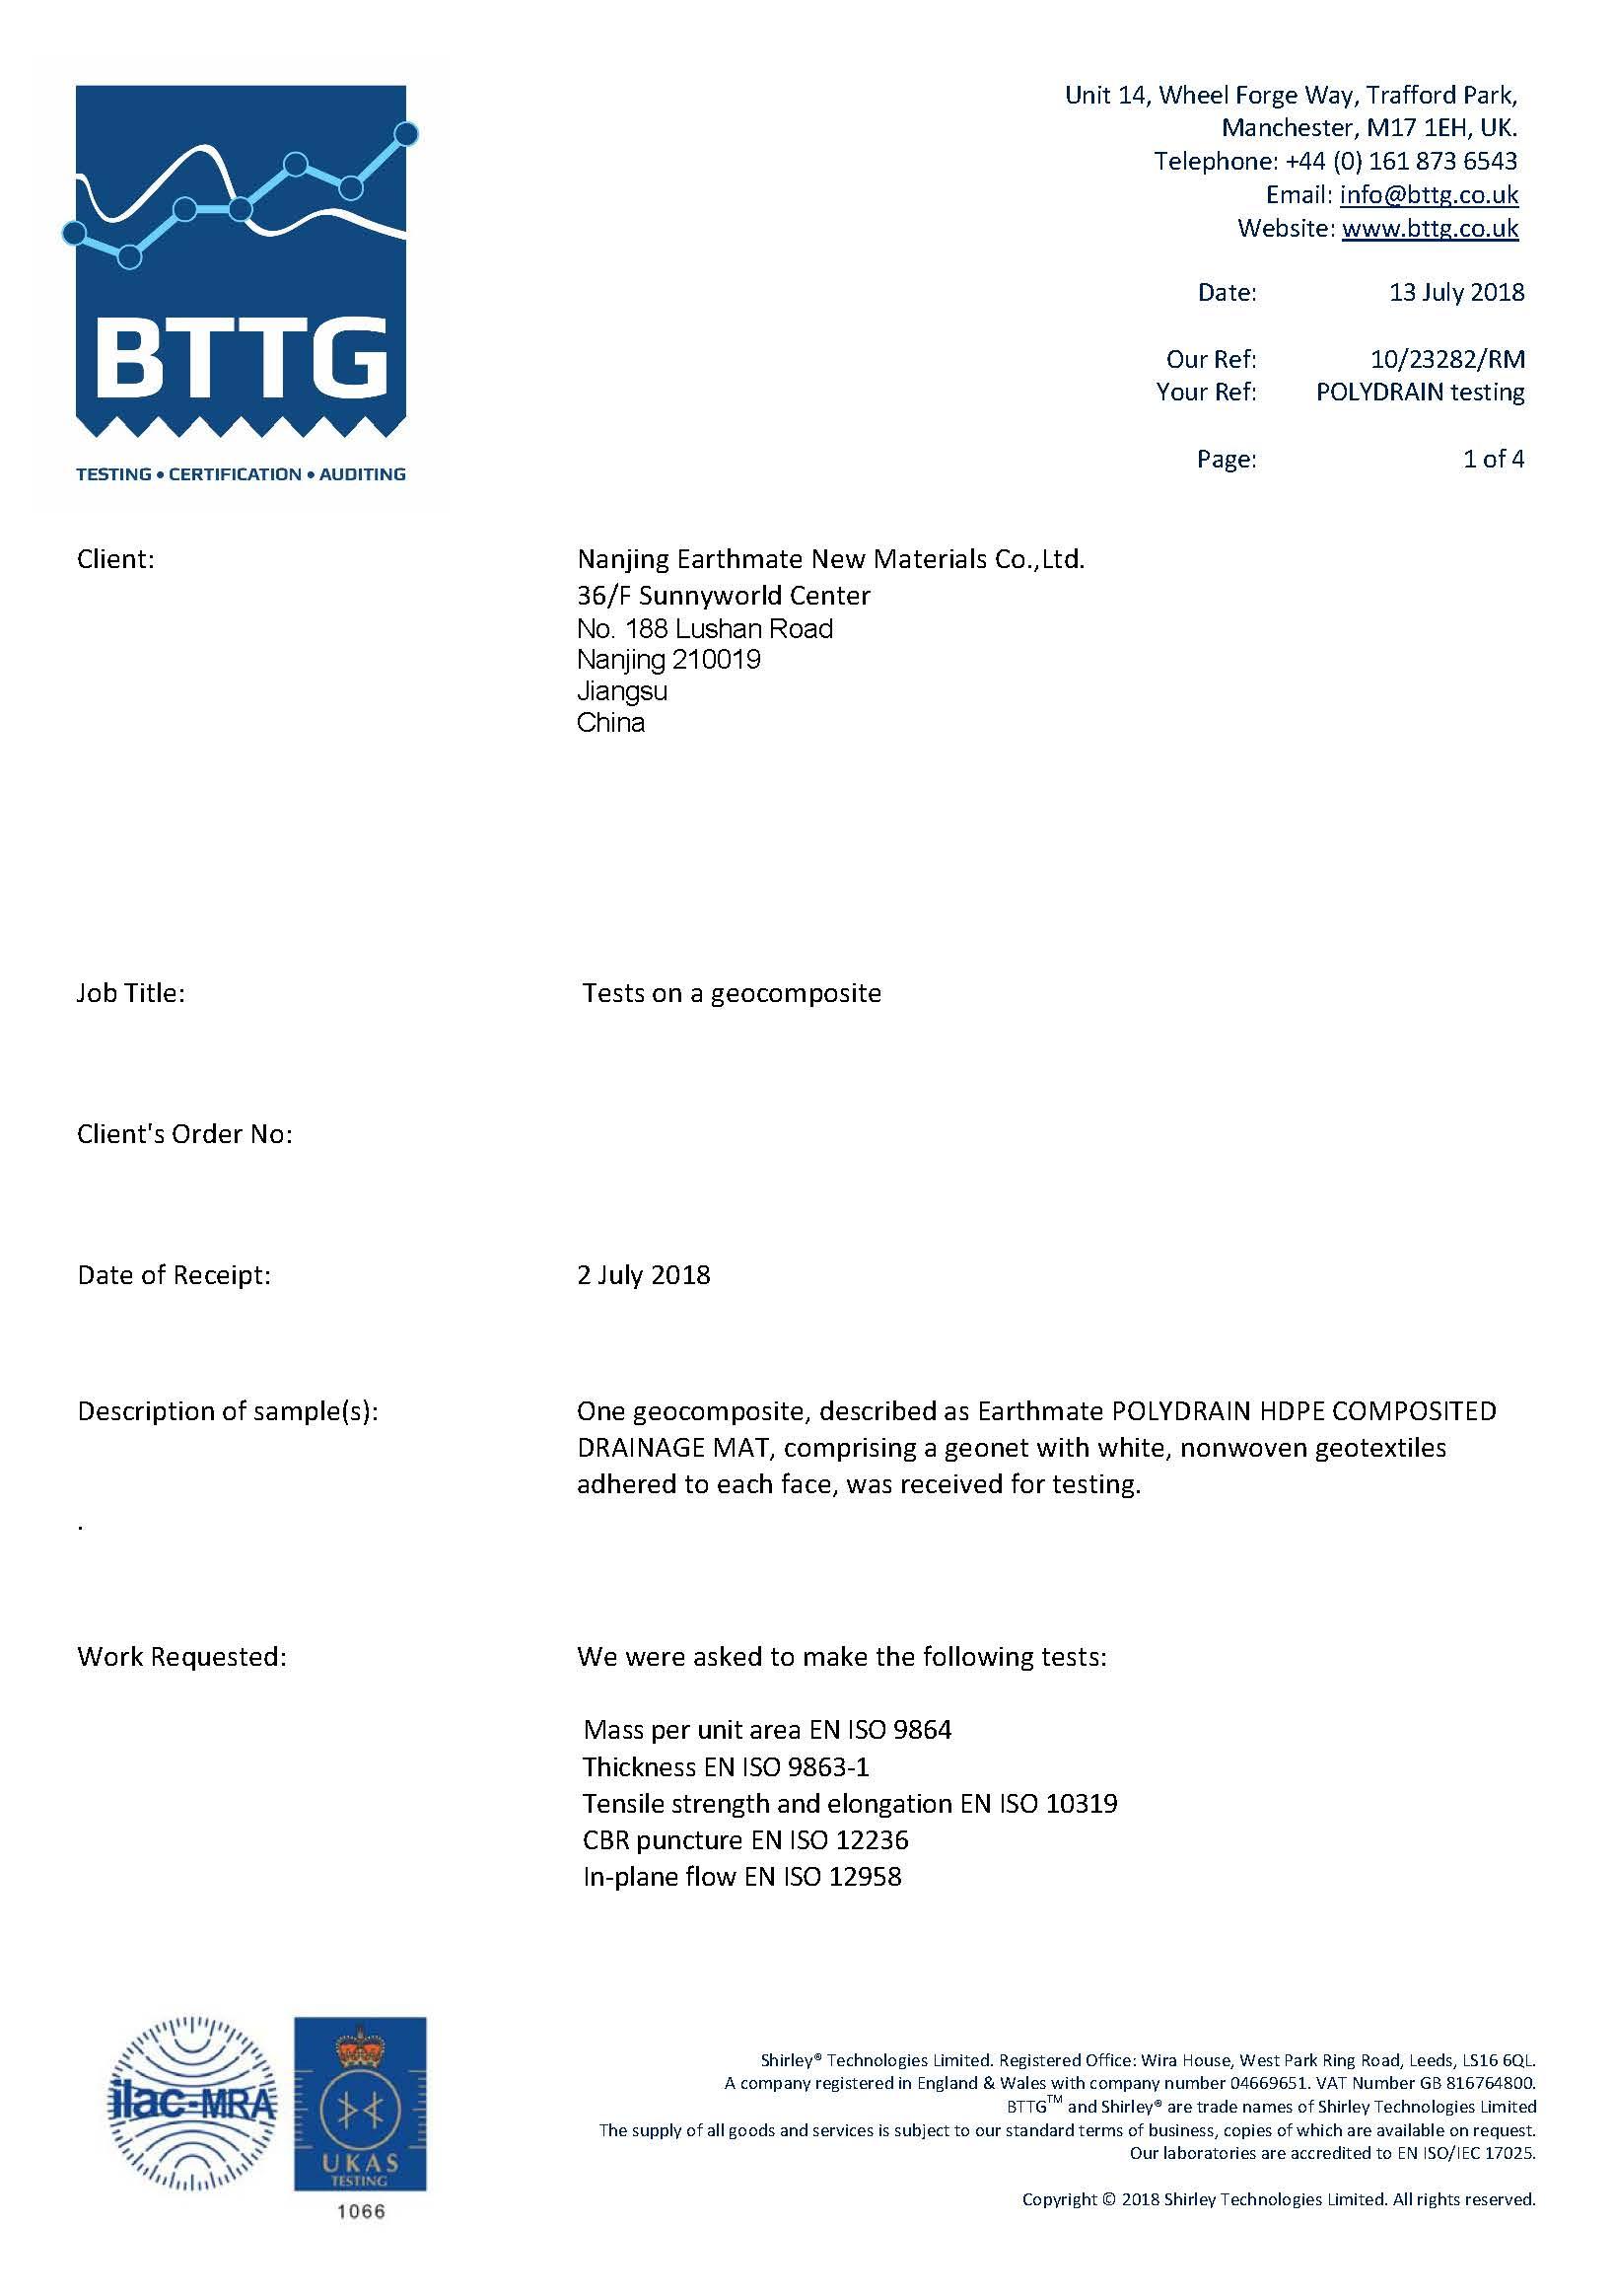 POLYDRAIN Compoisted Drainage Geonet Testing Report | BTTG,U.K.